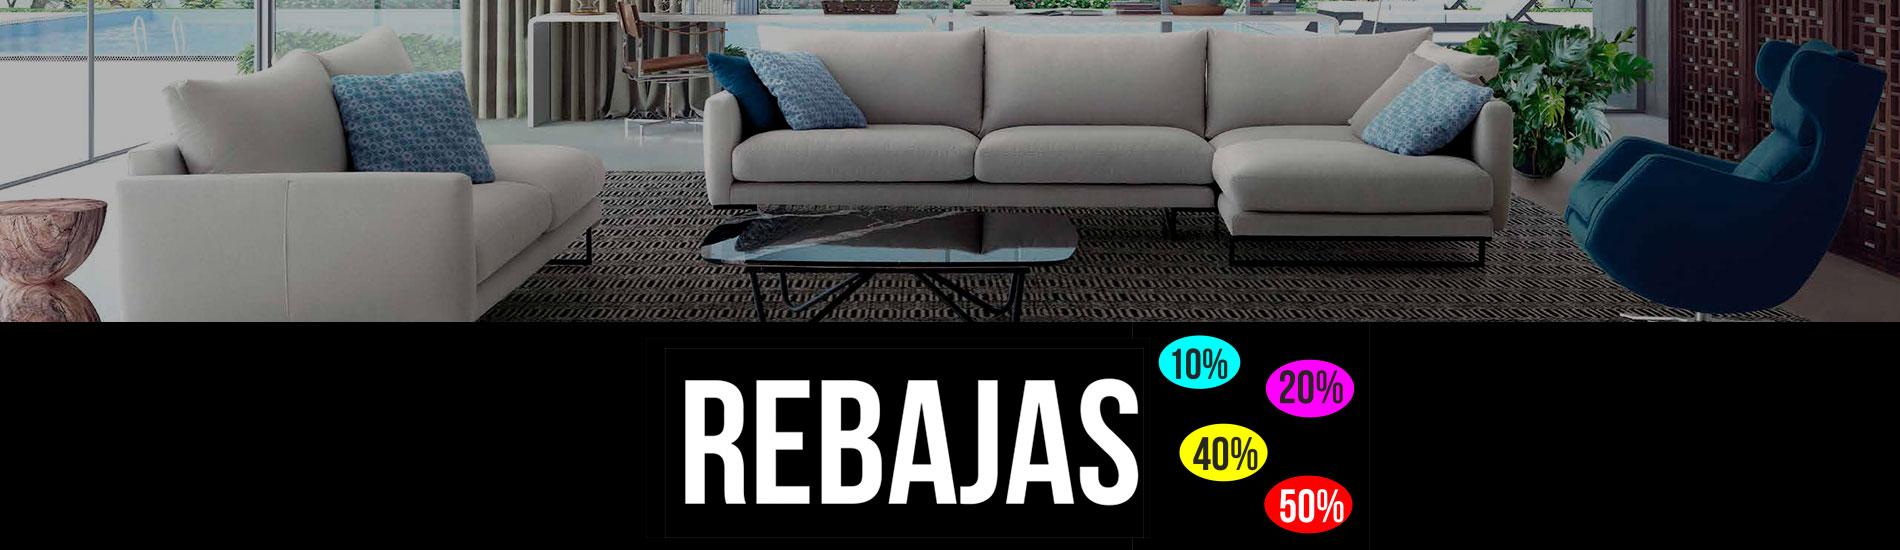 Tiendas De Sofas En Vigo Sof Relax Tapizado En Tela Apertura  # Muebles Padua Salamanca